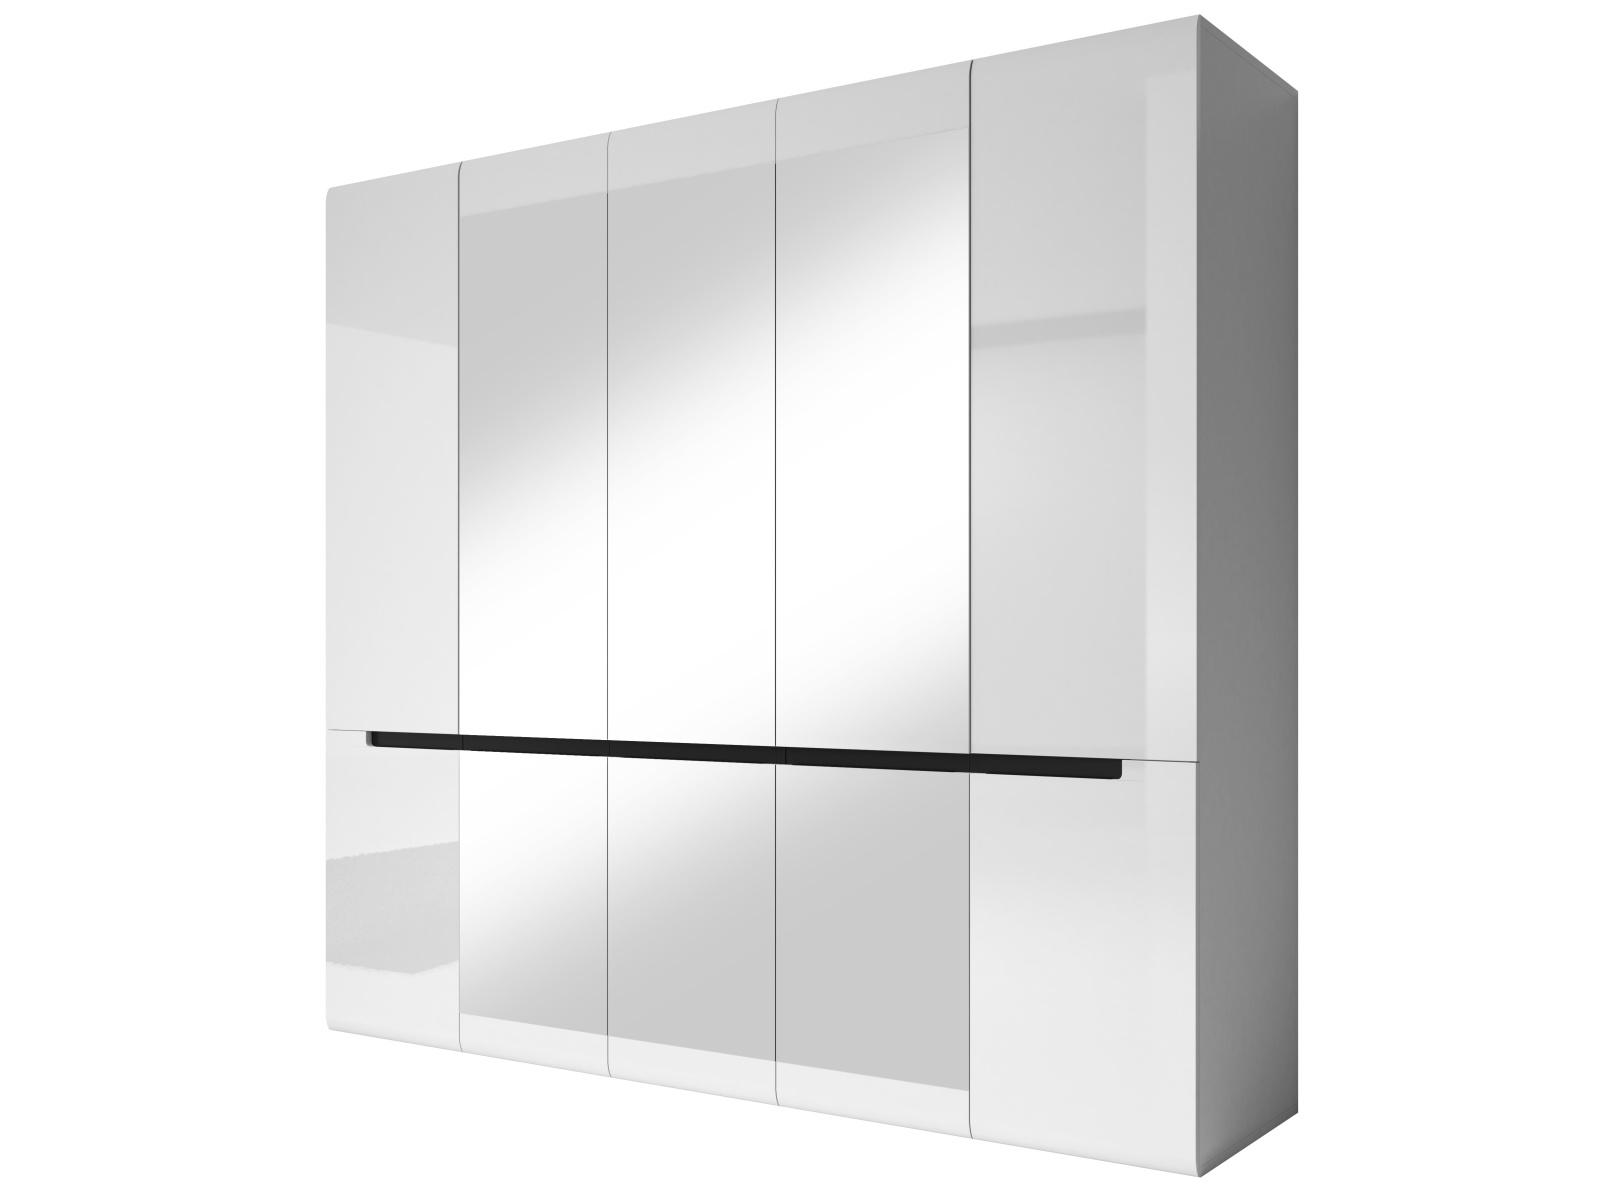 Smartshop HEKTOR šatní skříň se zrcadlem 225 TYP 21, bílá/bílý lesk